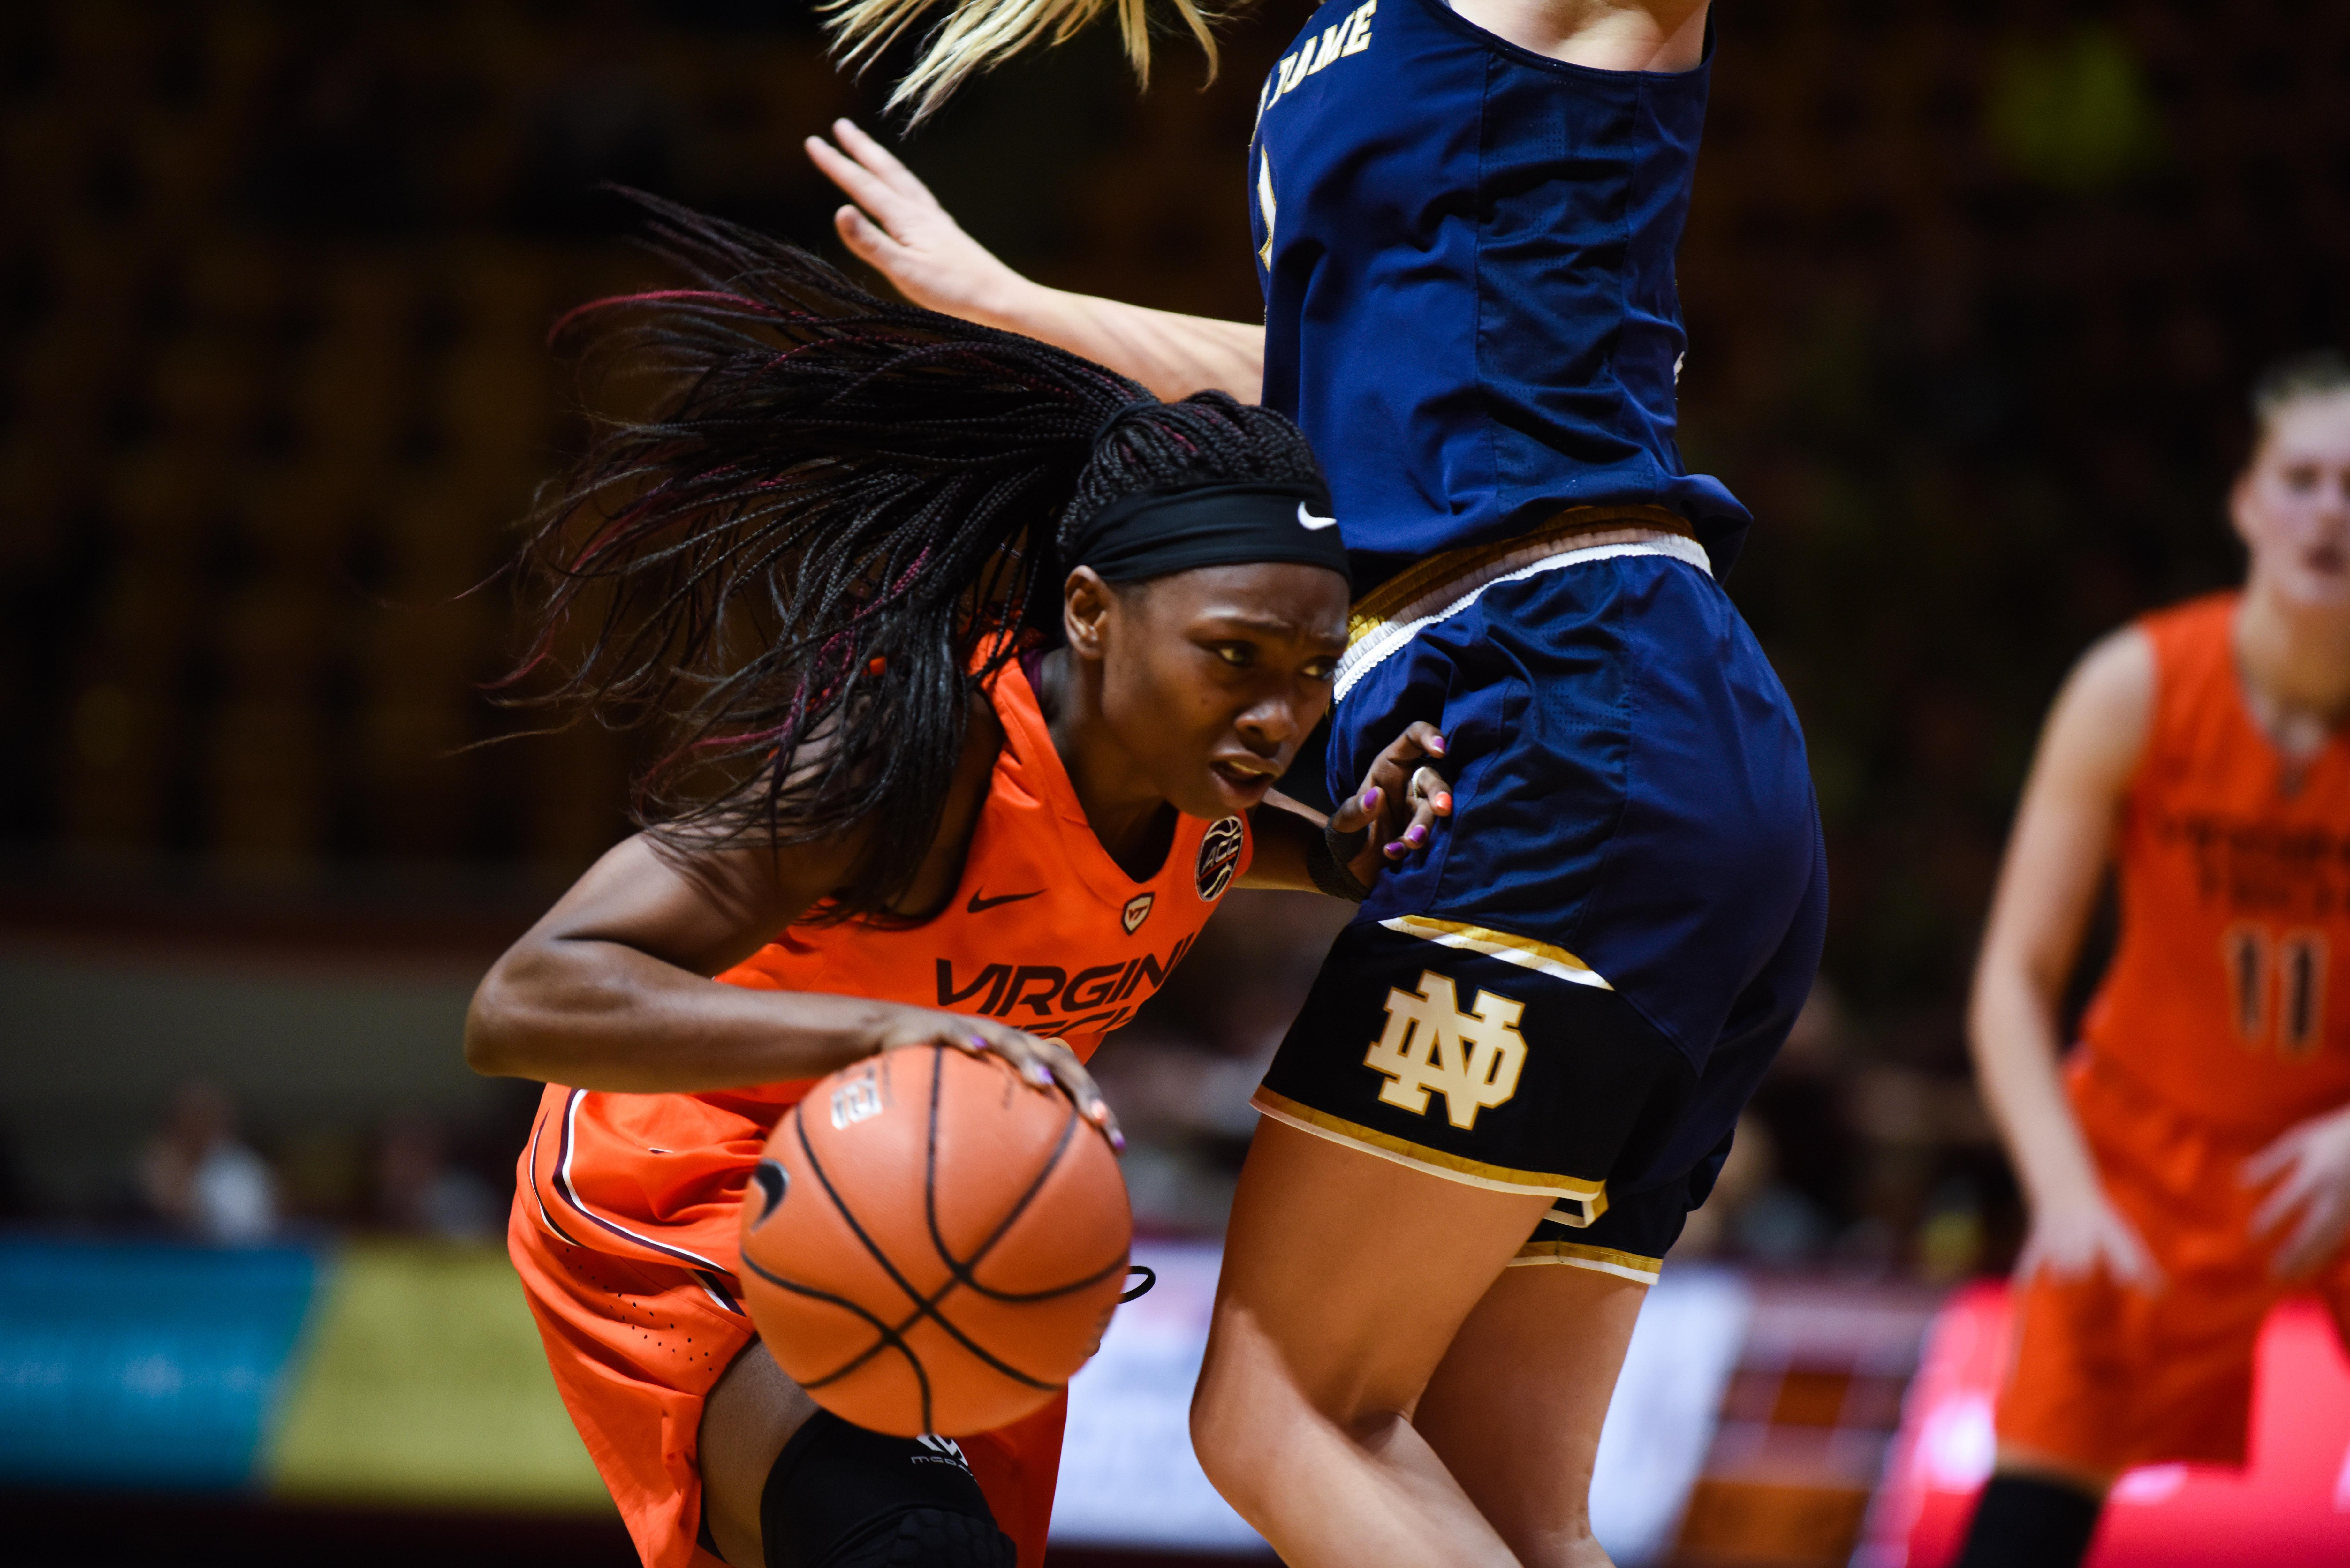 Virginia Tech women's basketball Chanette Hicks